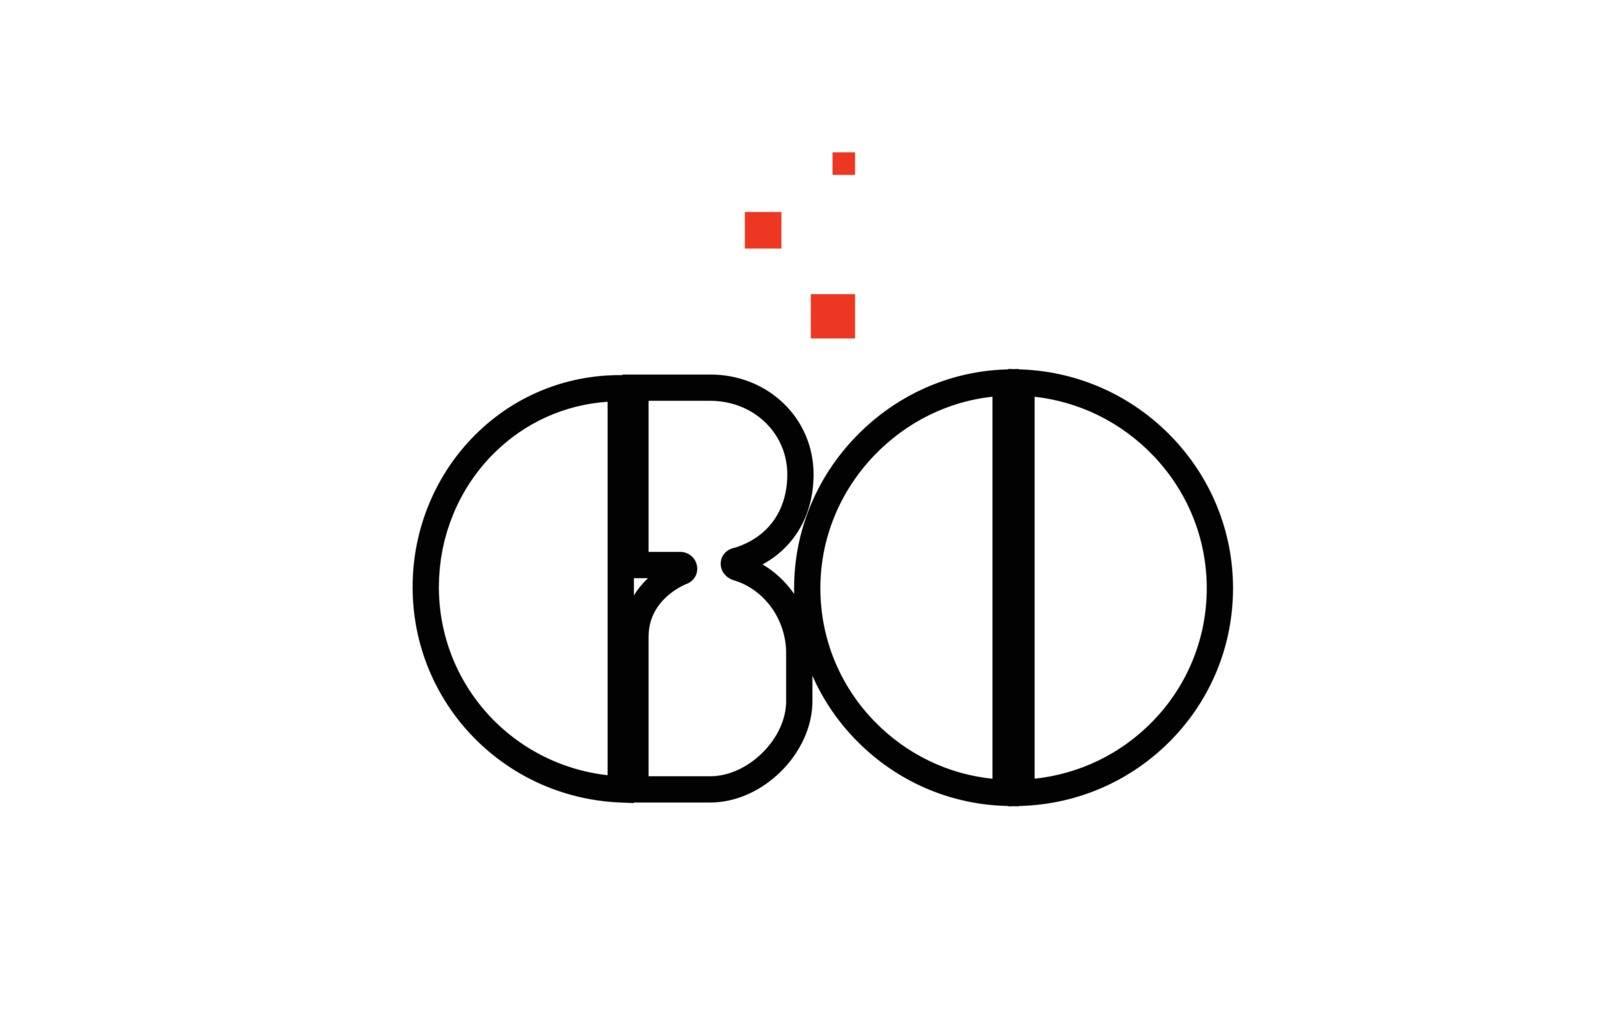 GO G O black white red alphabet letter combination logo icon des by dragomirescu